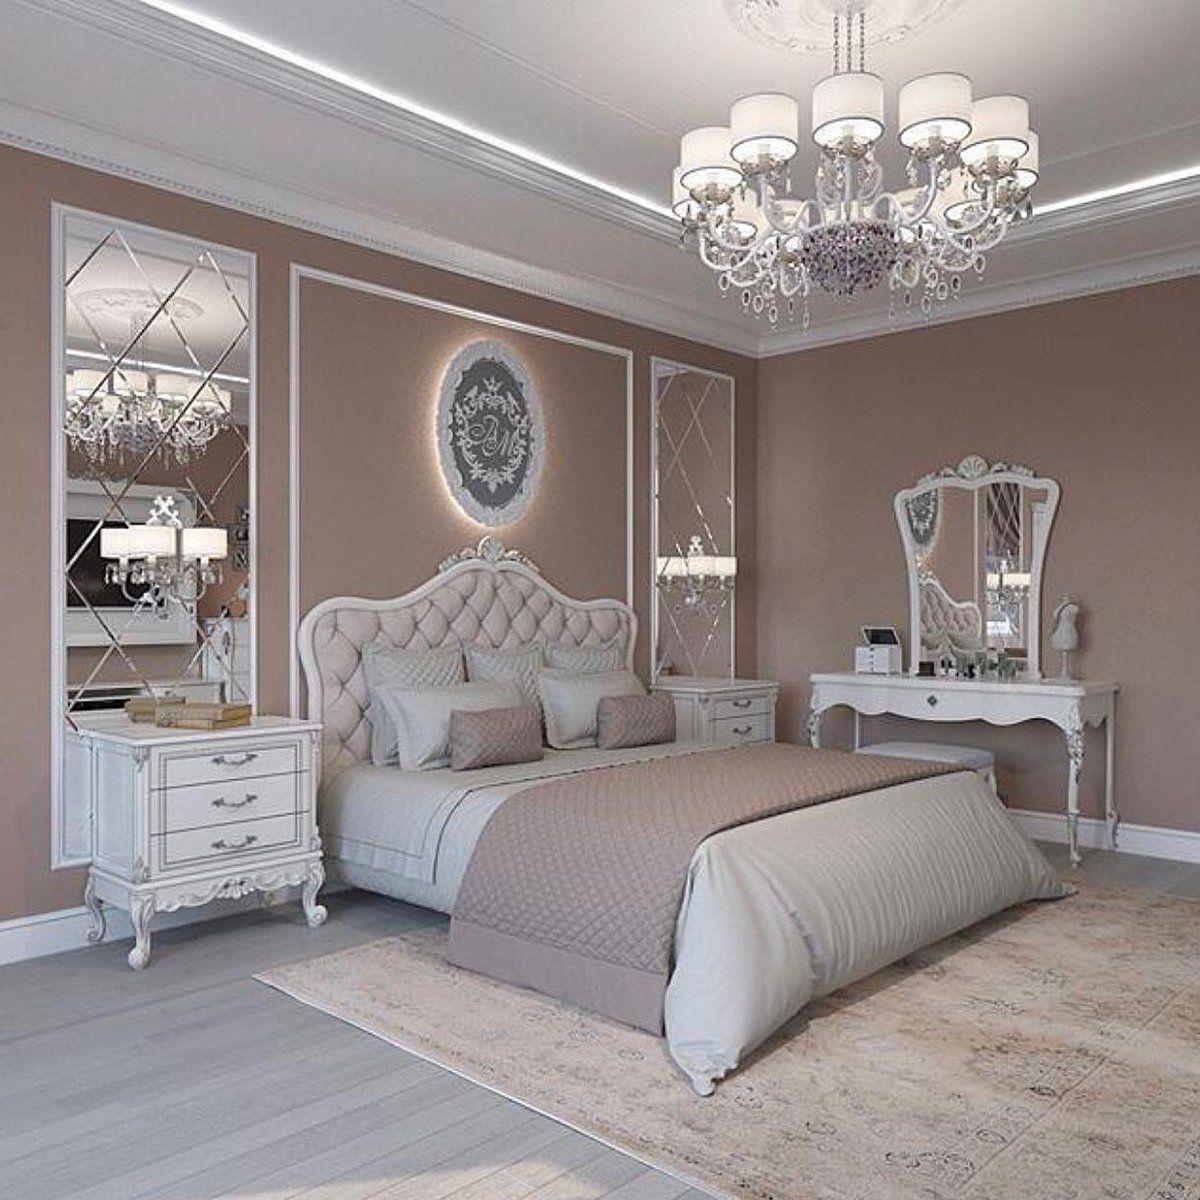 The Elements Of Venetian Interior Design Luxurious Bedrooms Master Bedrooms Decor Classic Bedroom Decor